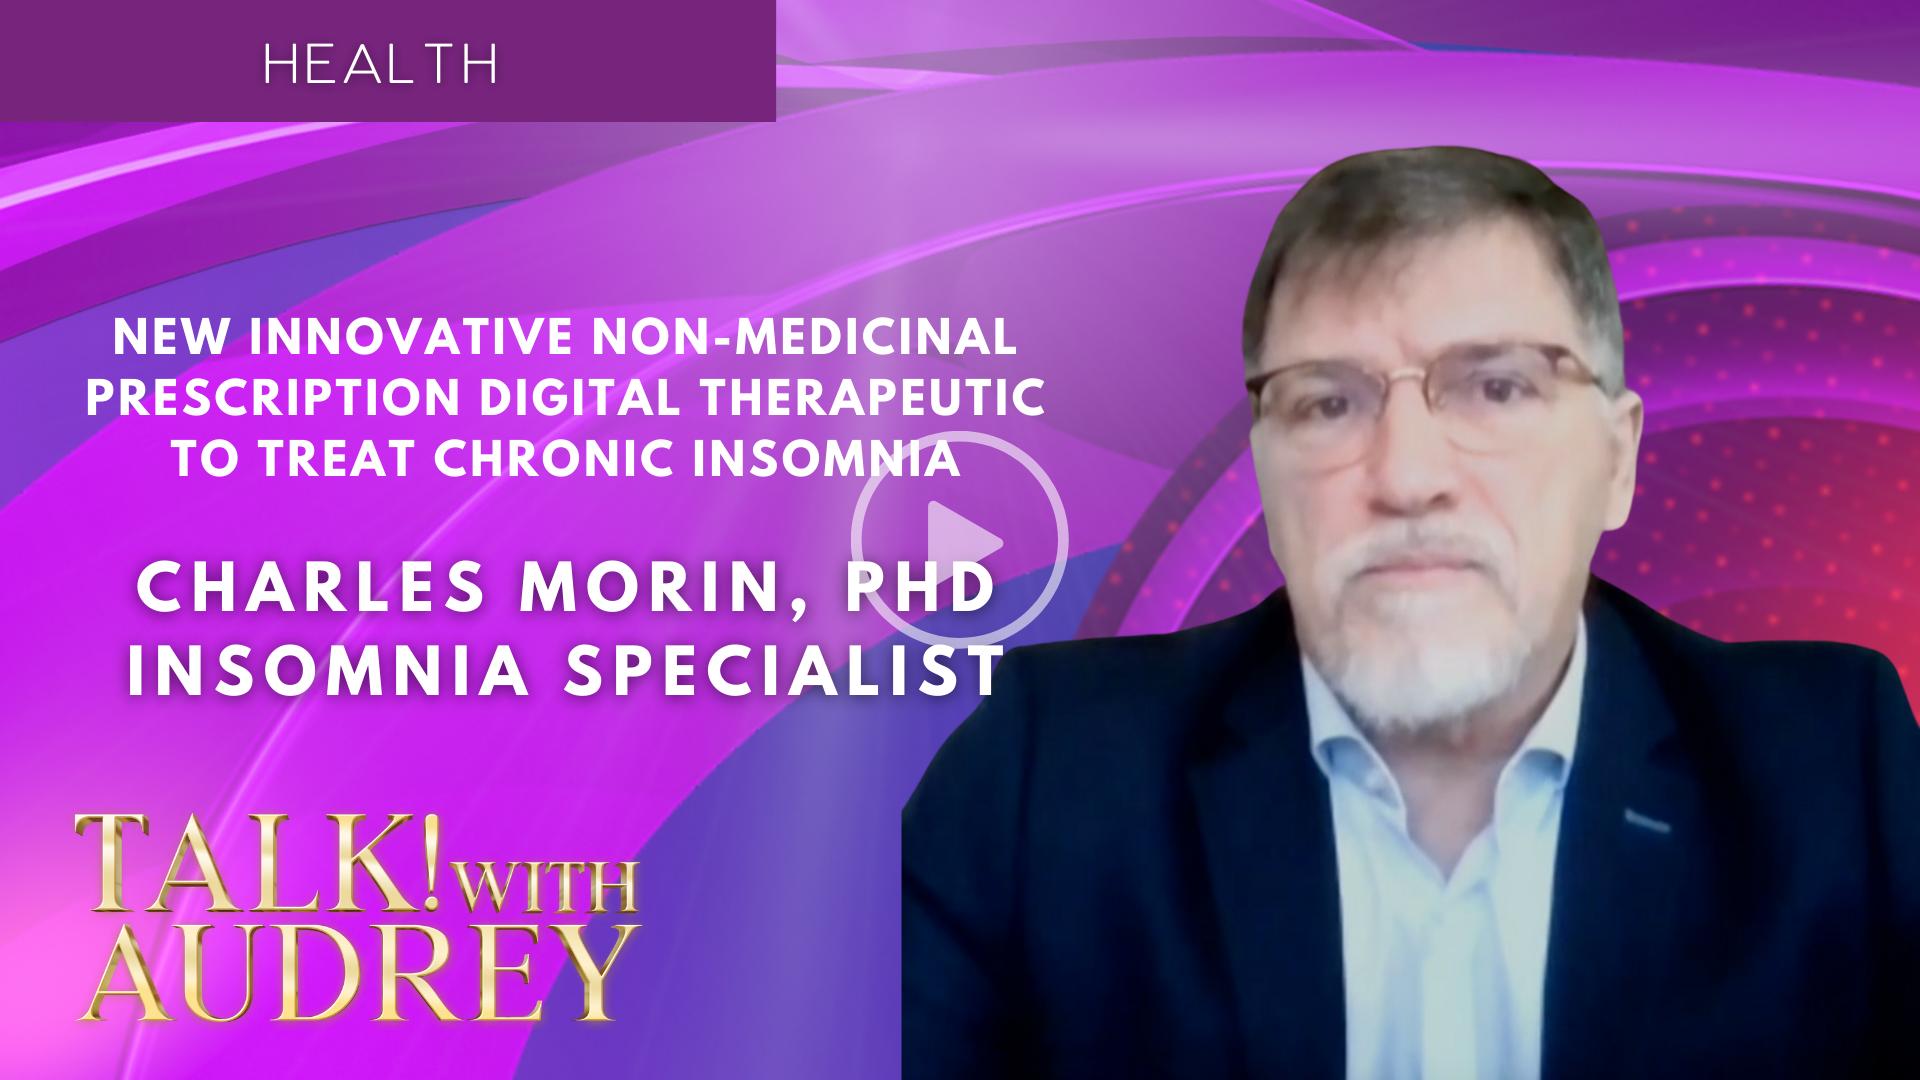 Charles Morin, PHD – New Innovative Non-Medicinal Prescription Digital Therapeutic to Treat Chronic Insomnia